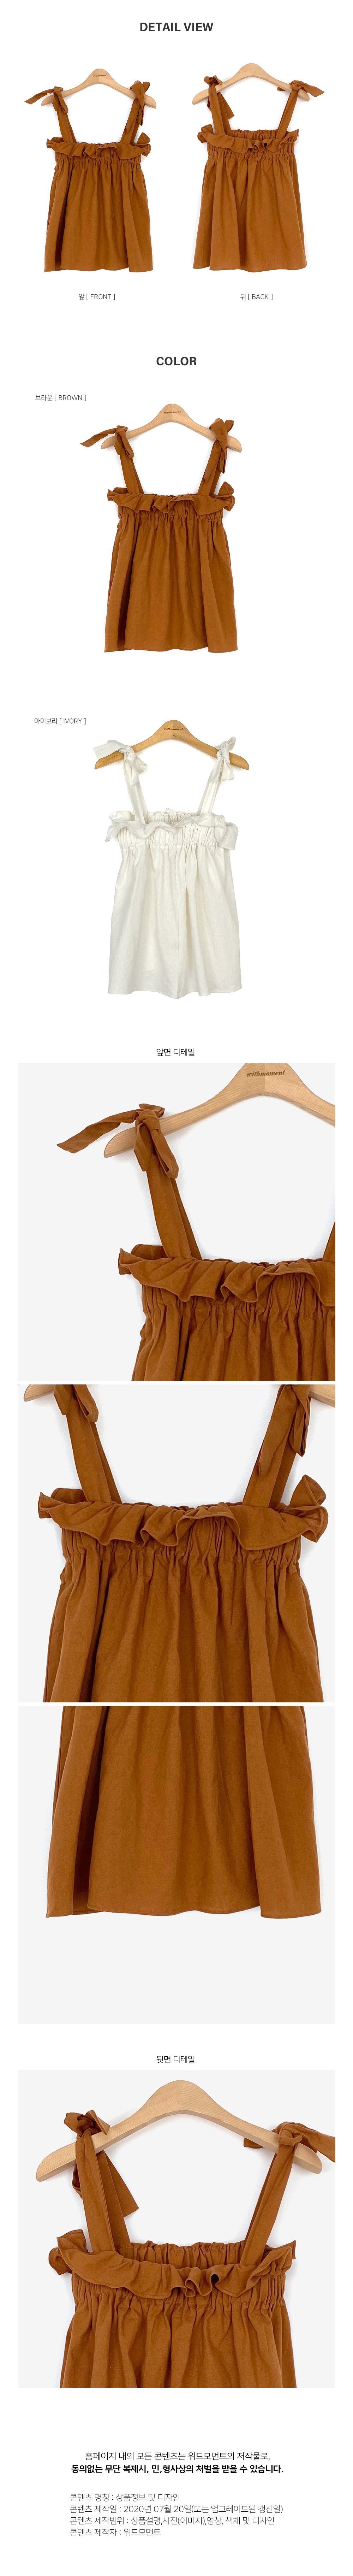 Accordion sleeveless